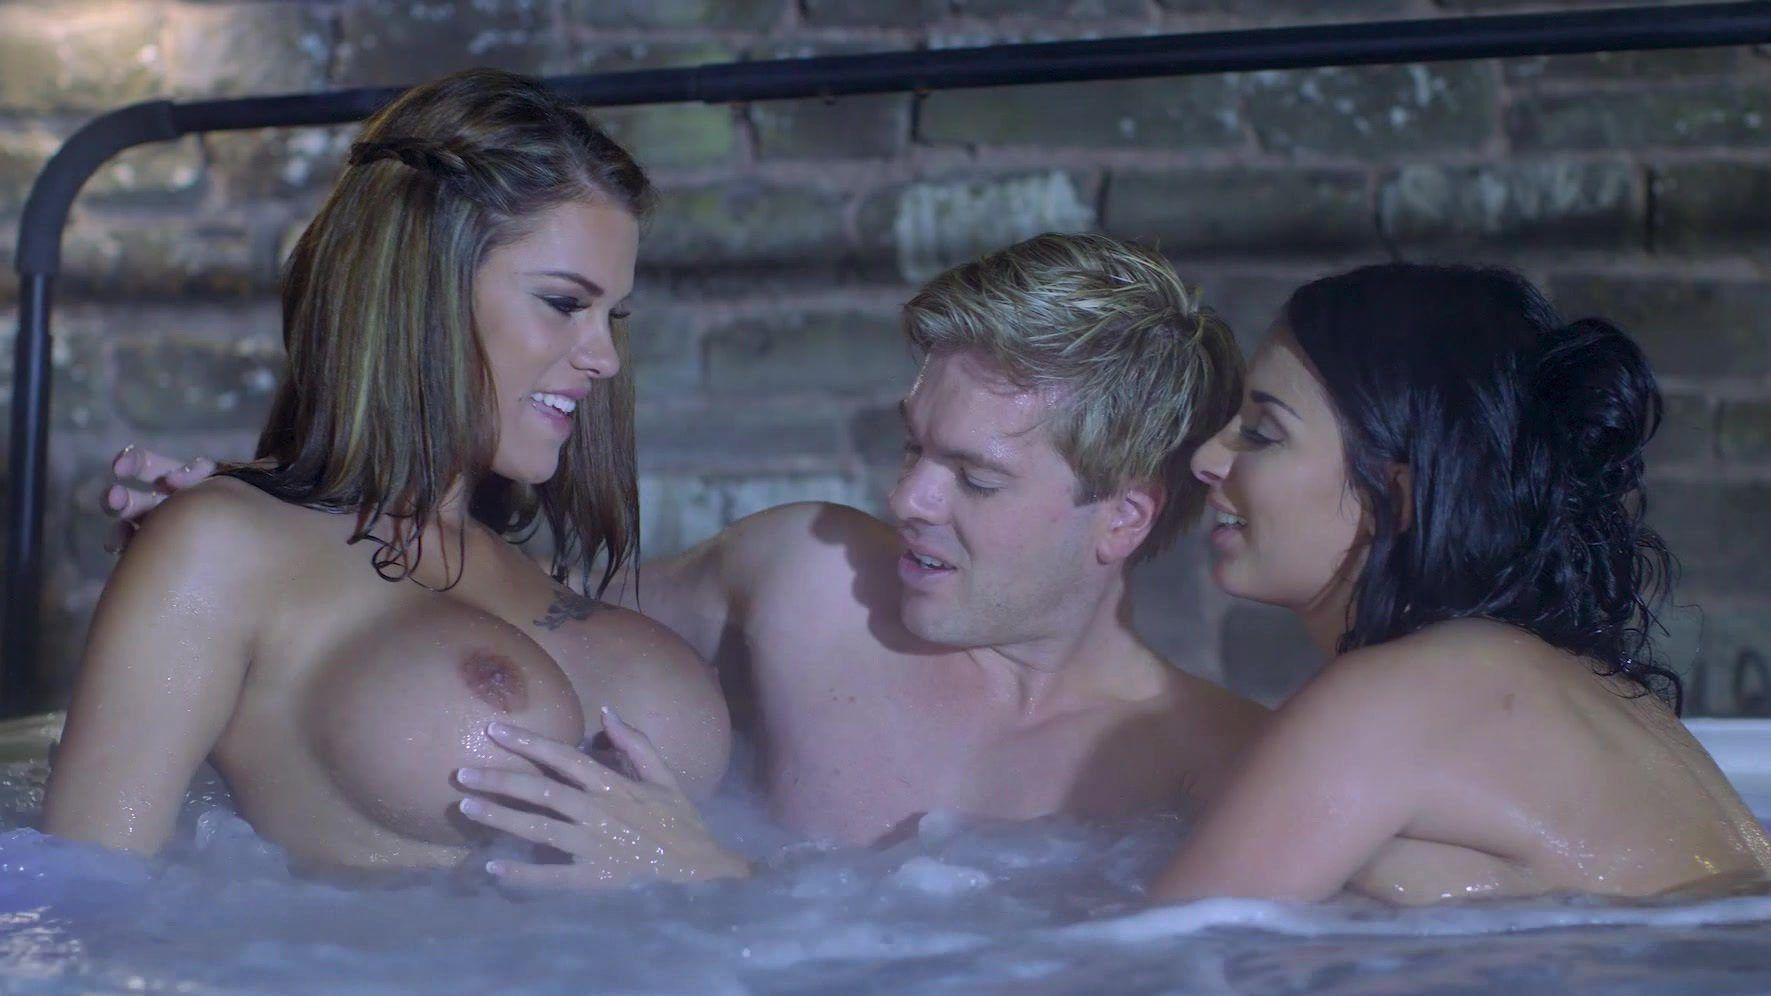 Z reccomend behind the scenes threesome